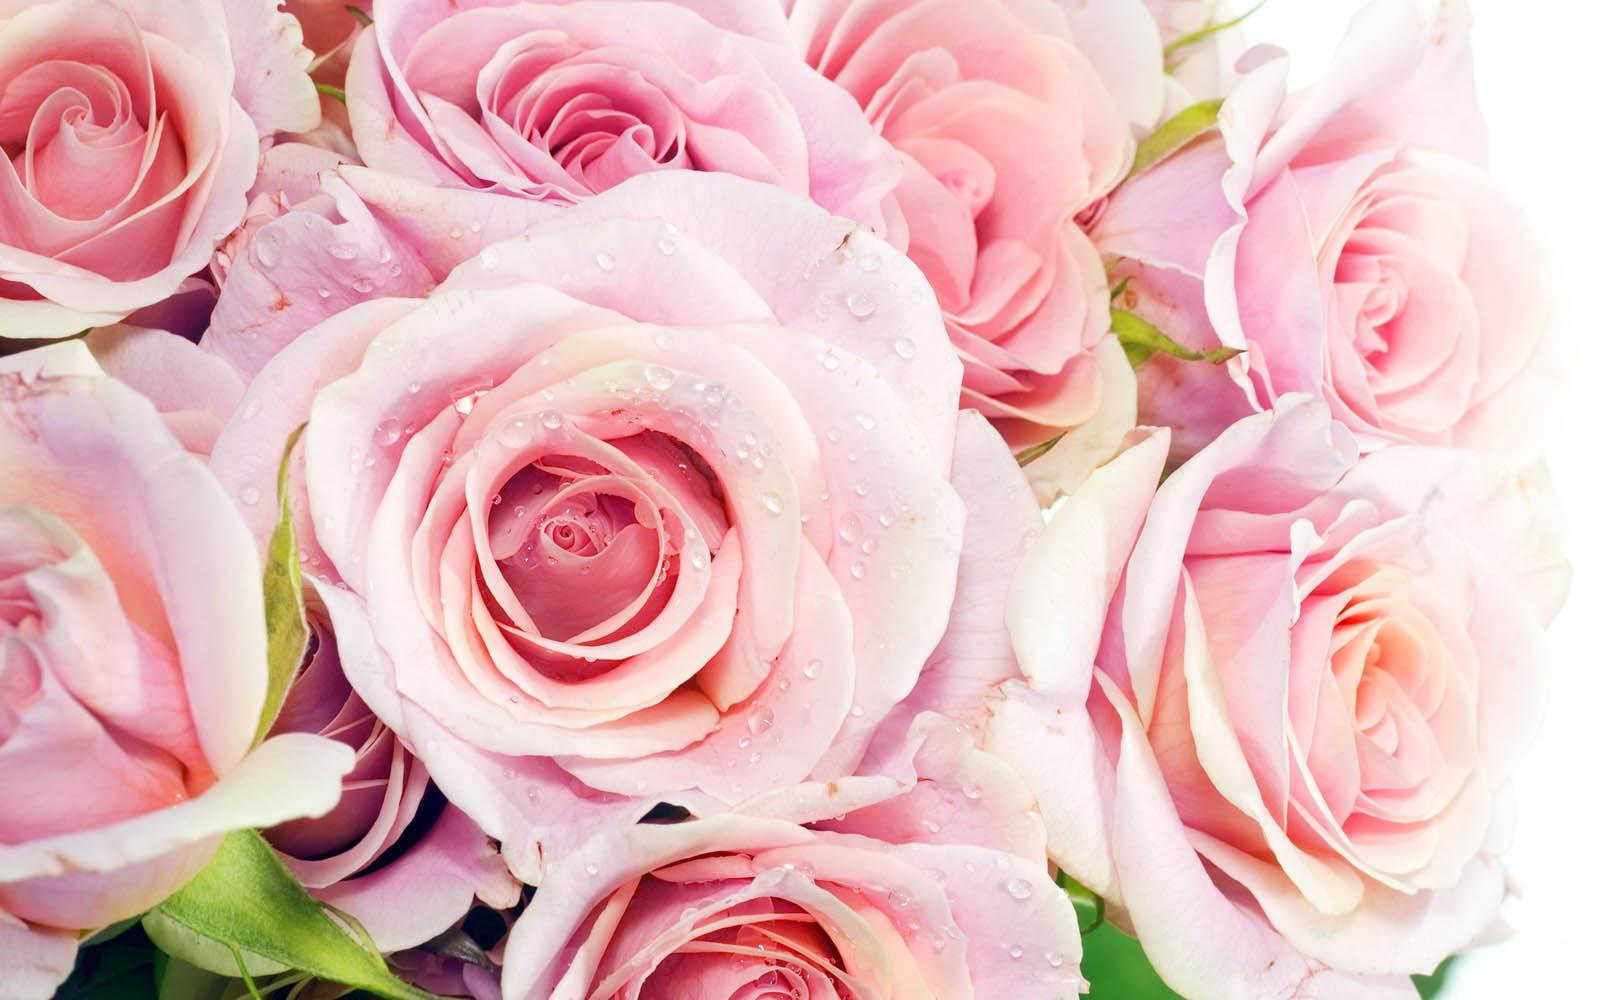 http://1.bp.blogspot.com/-u_tOgUYAUkI/UEXIqeGib0I/AAAAAAAAJQ8/FXHUyghNxPI/s1600/Pink+Rose+Wallpapers+2.jpg